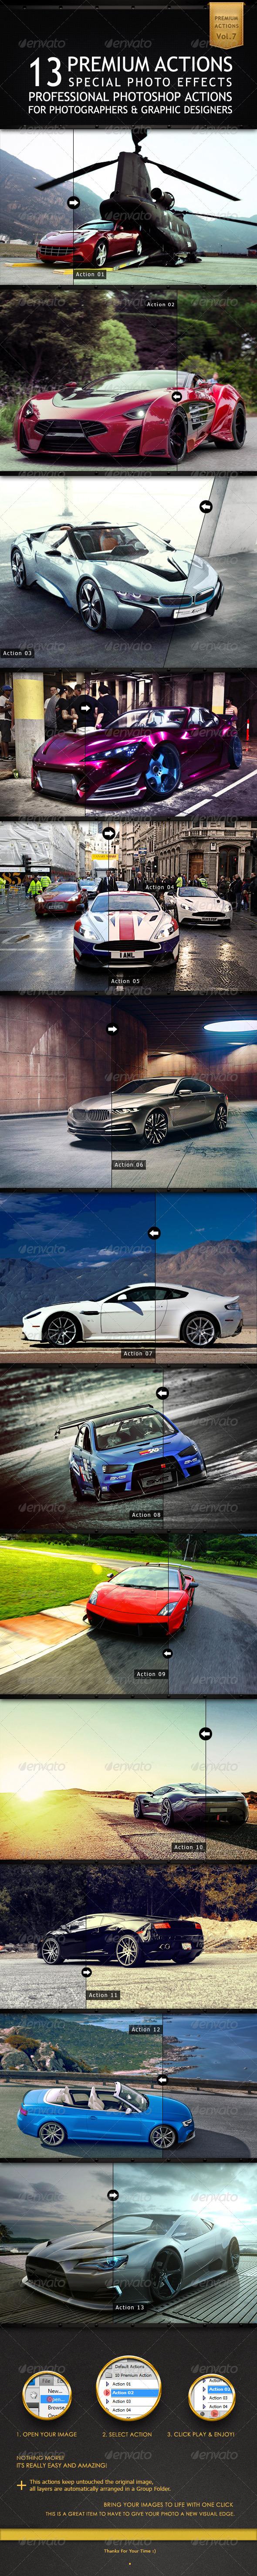 GraphicRiver 13 Premium Actions 6520864